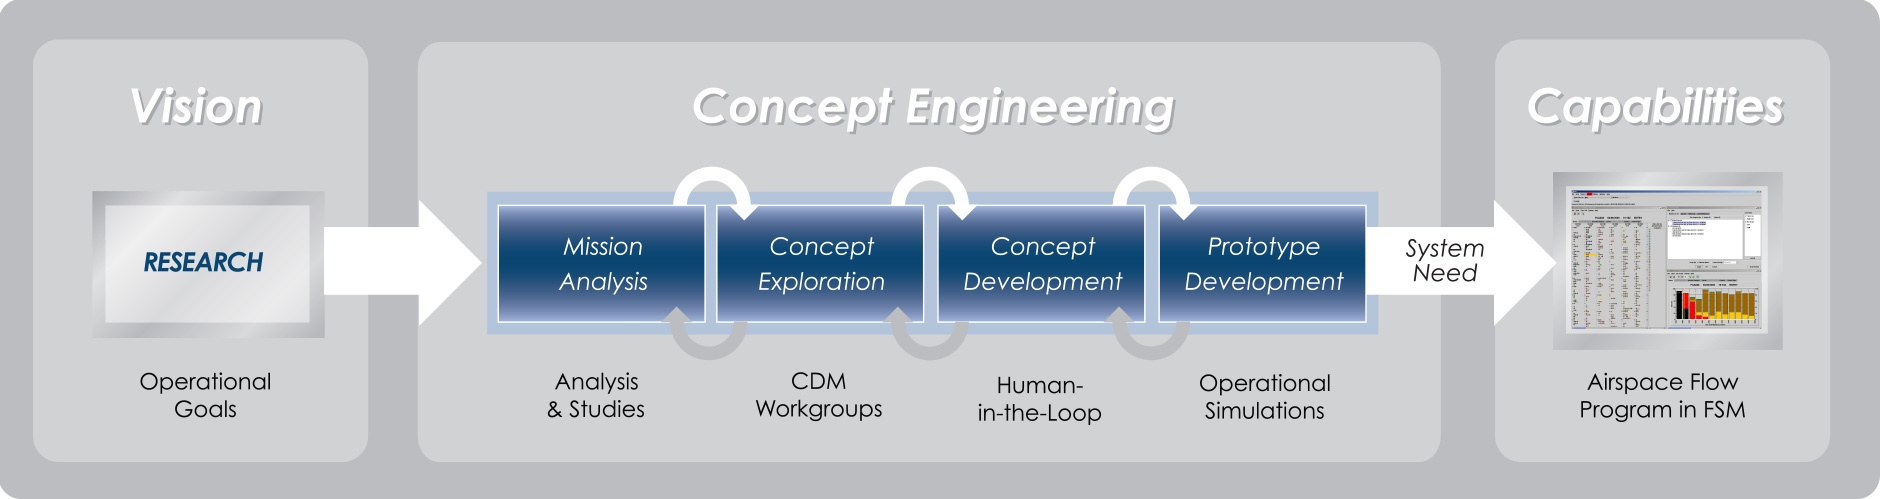 metron-aviation-concept-engineering-graphic